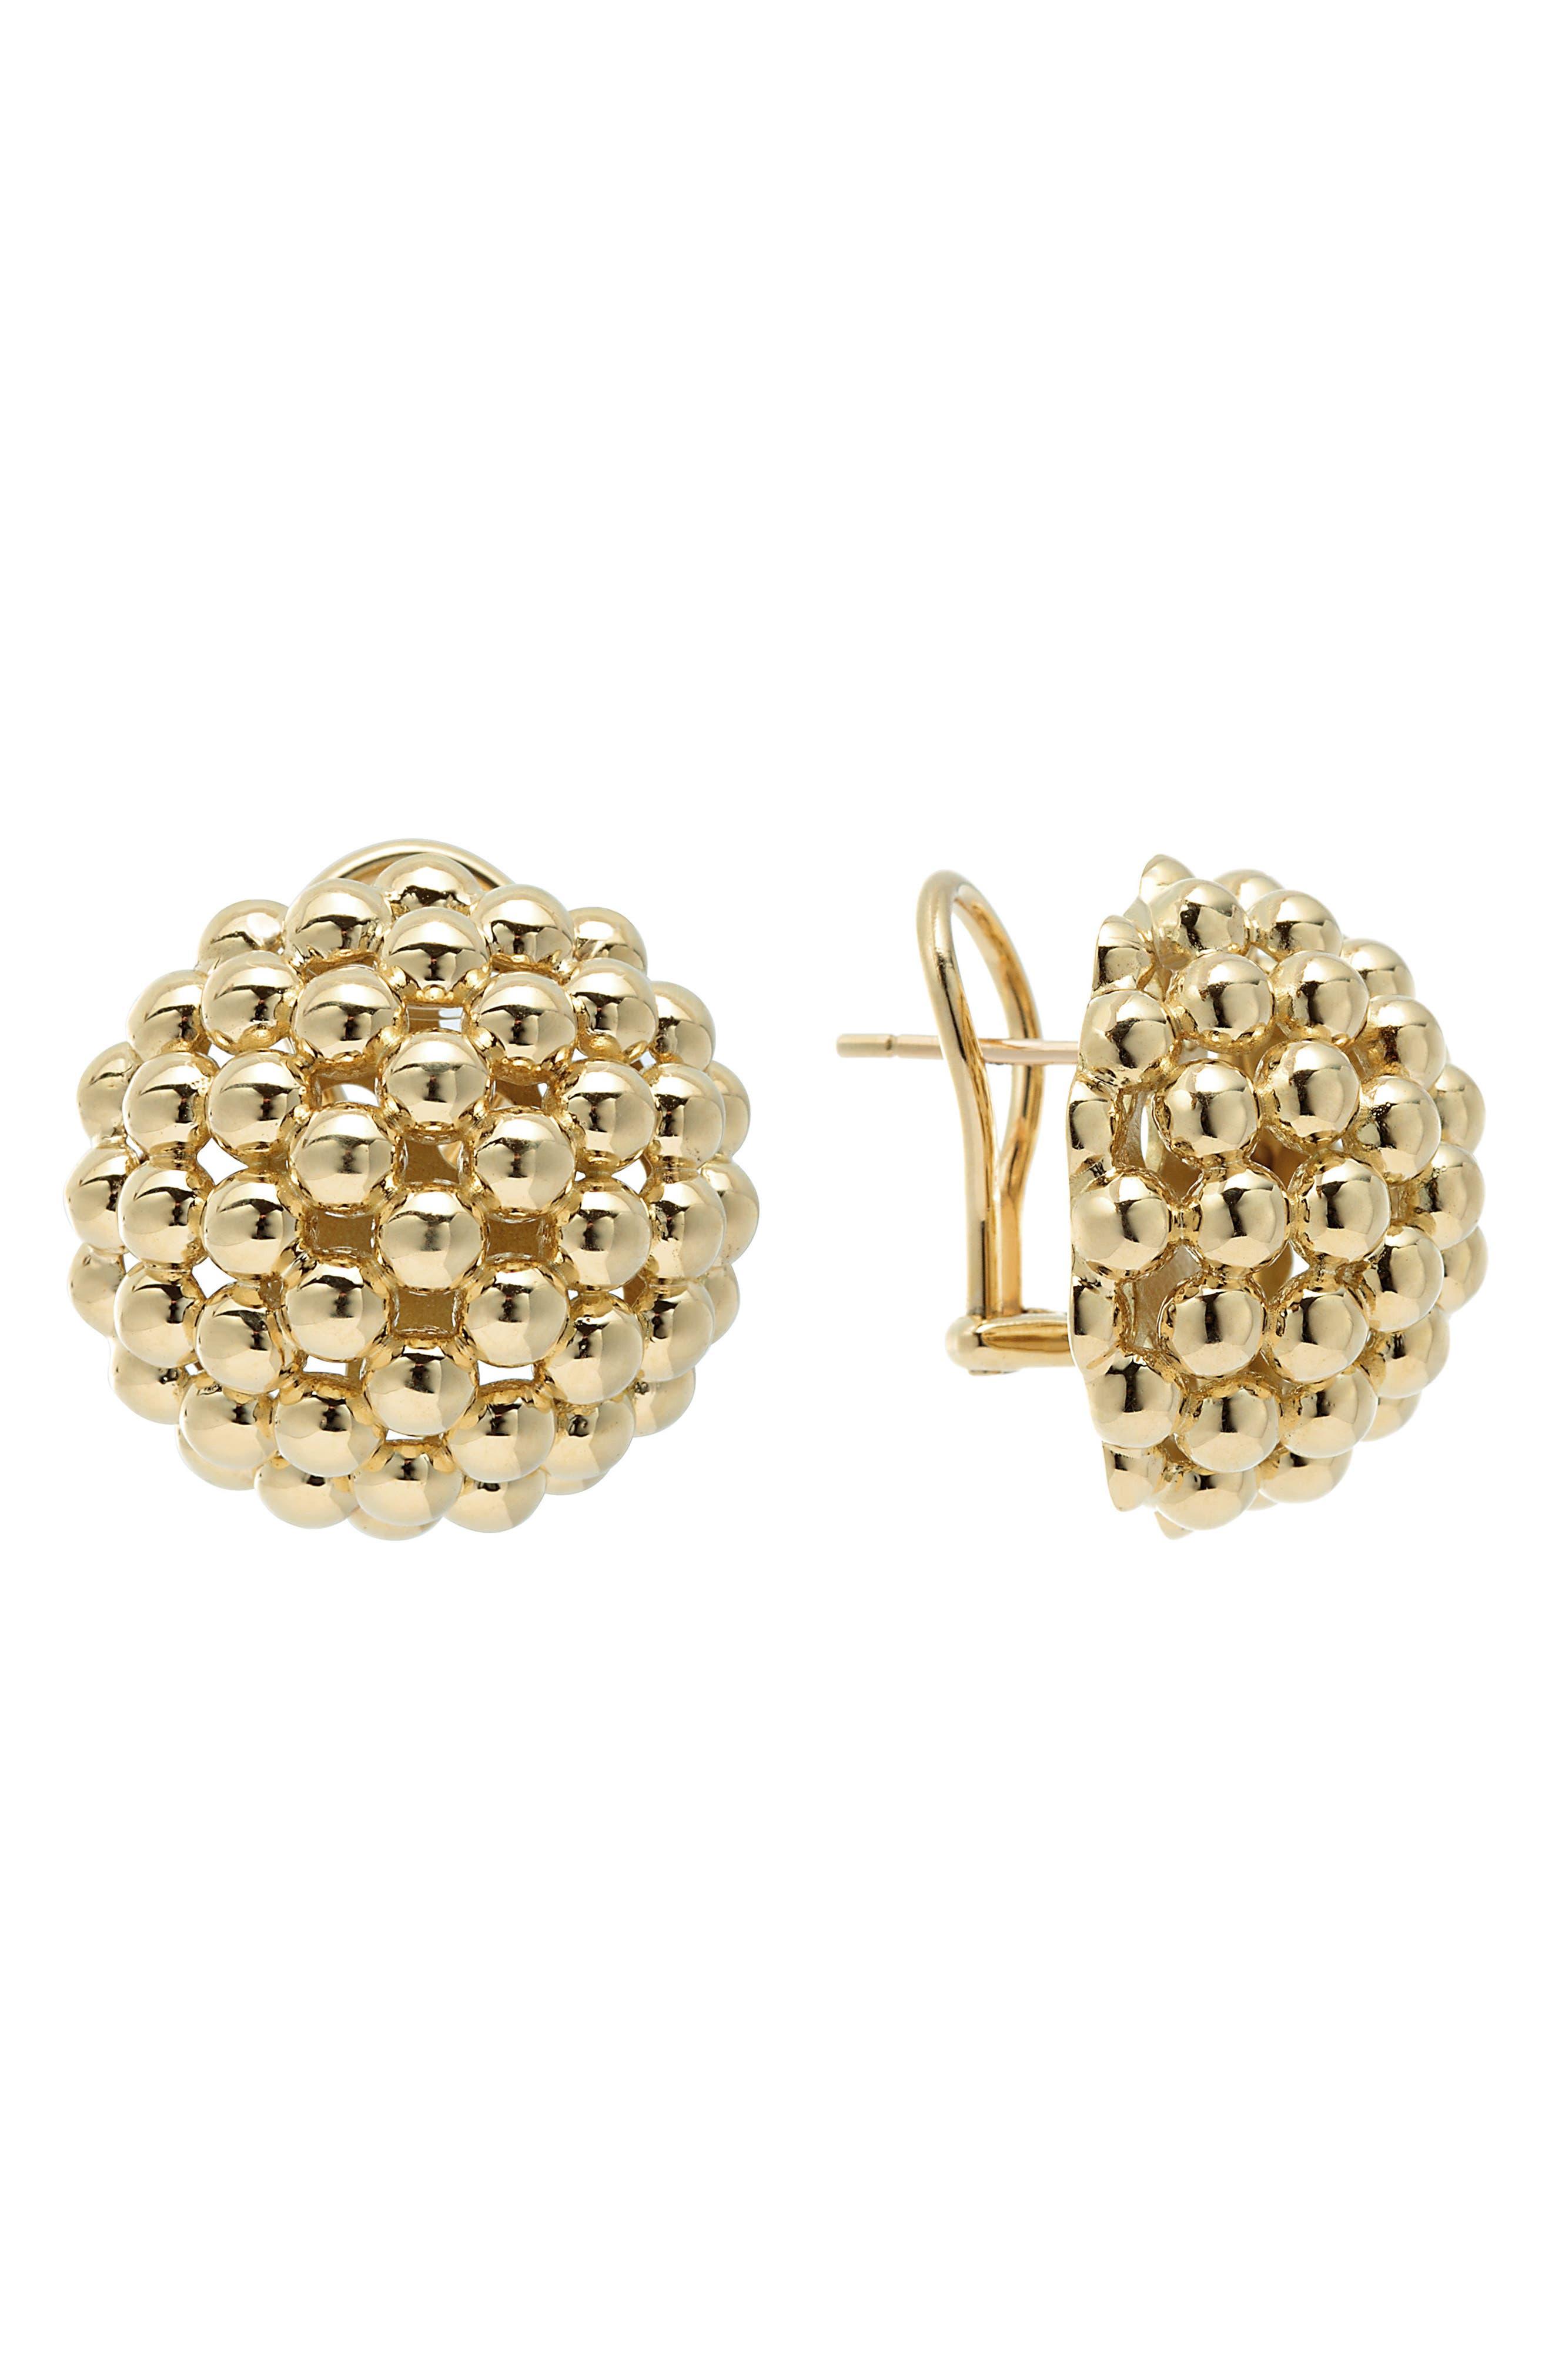 LAGOS Caviar Gold Dome Omega Earrings